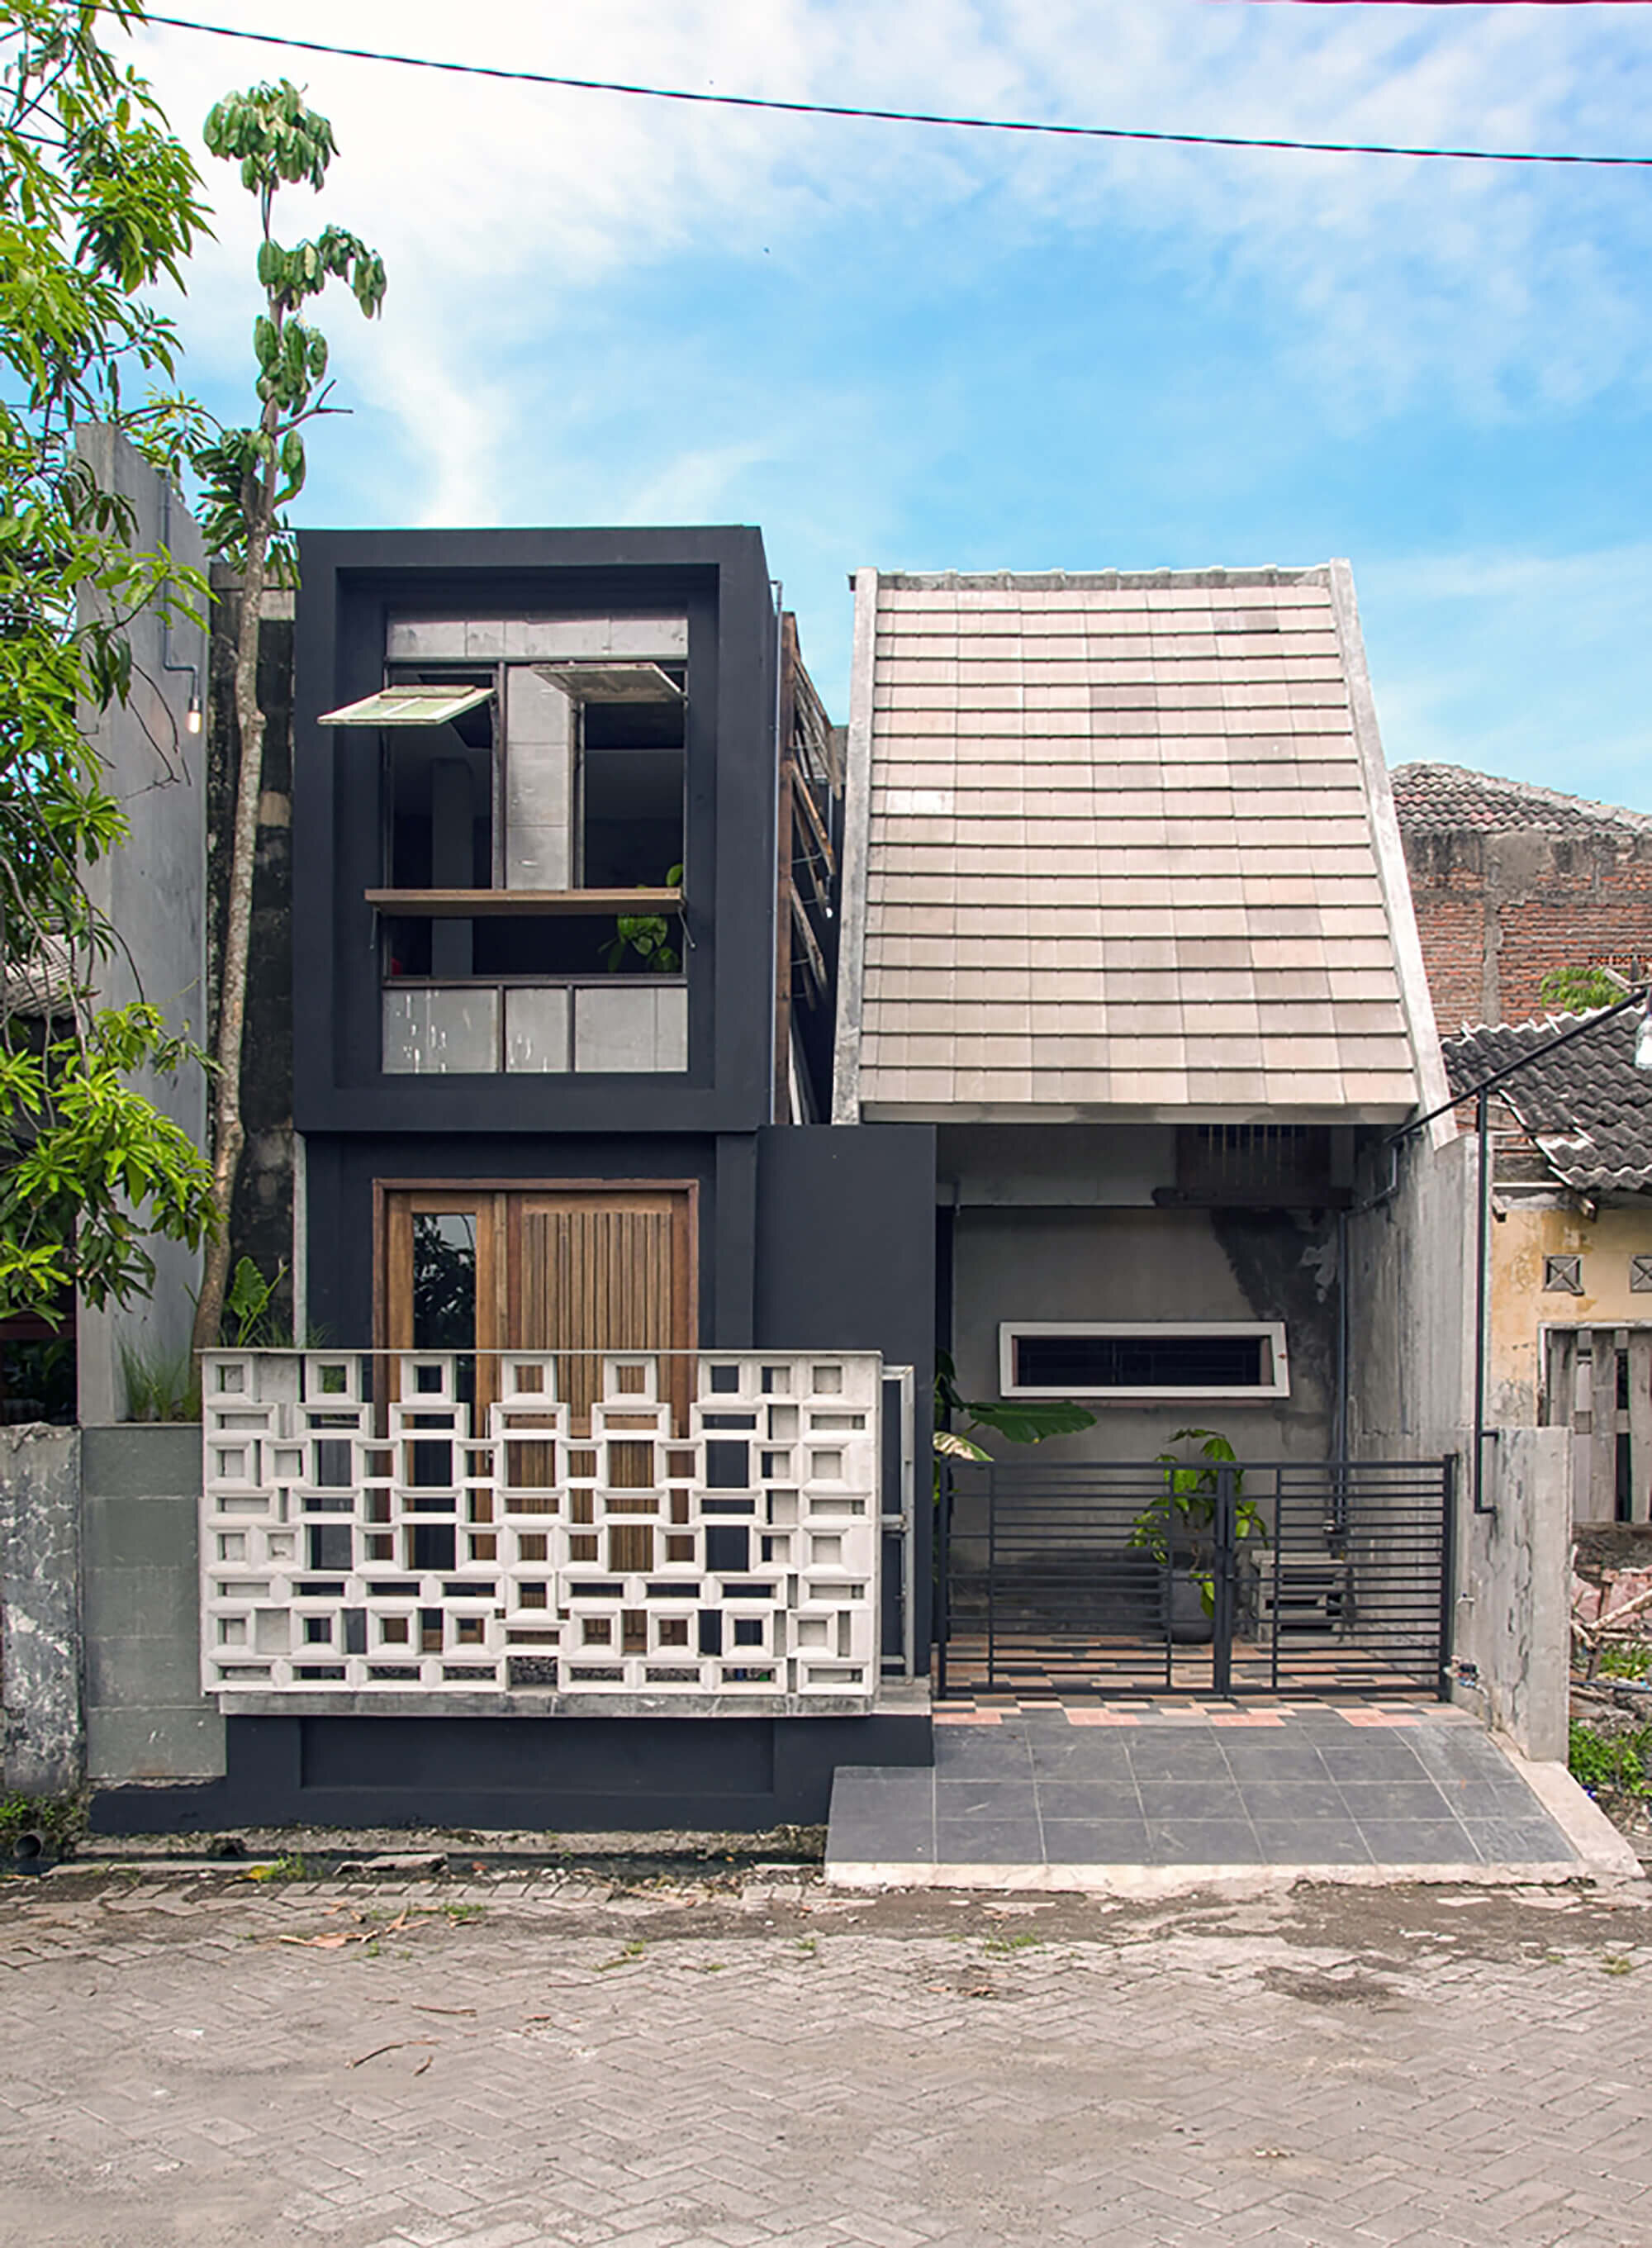 The-Obsolete-House-Omah-Amoh-Gayuh-Budi-Utomo-Indonesia-7